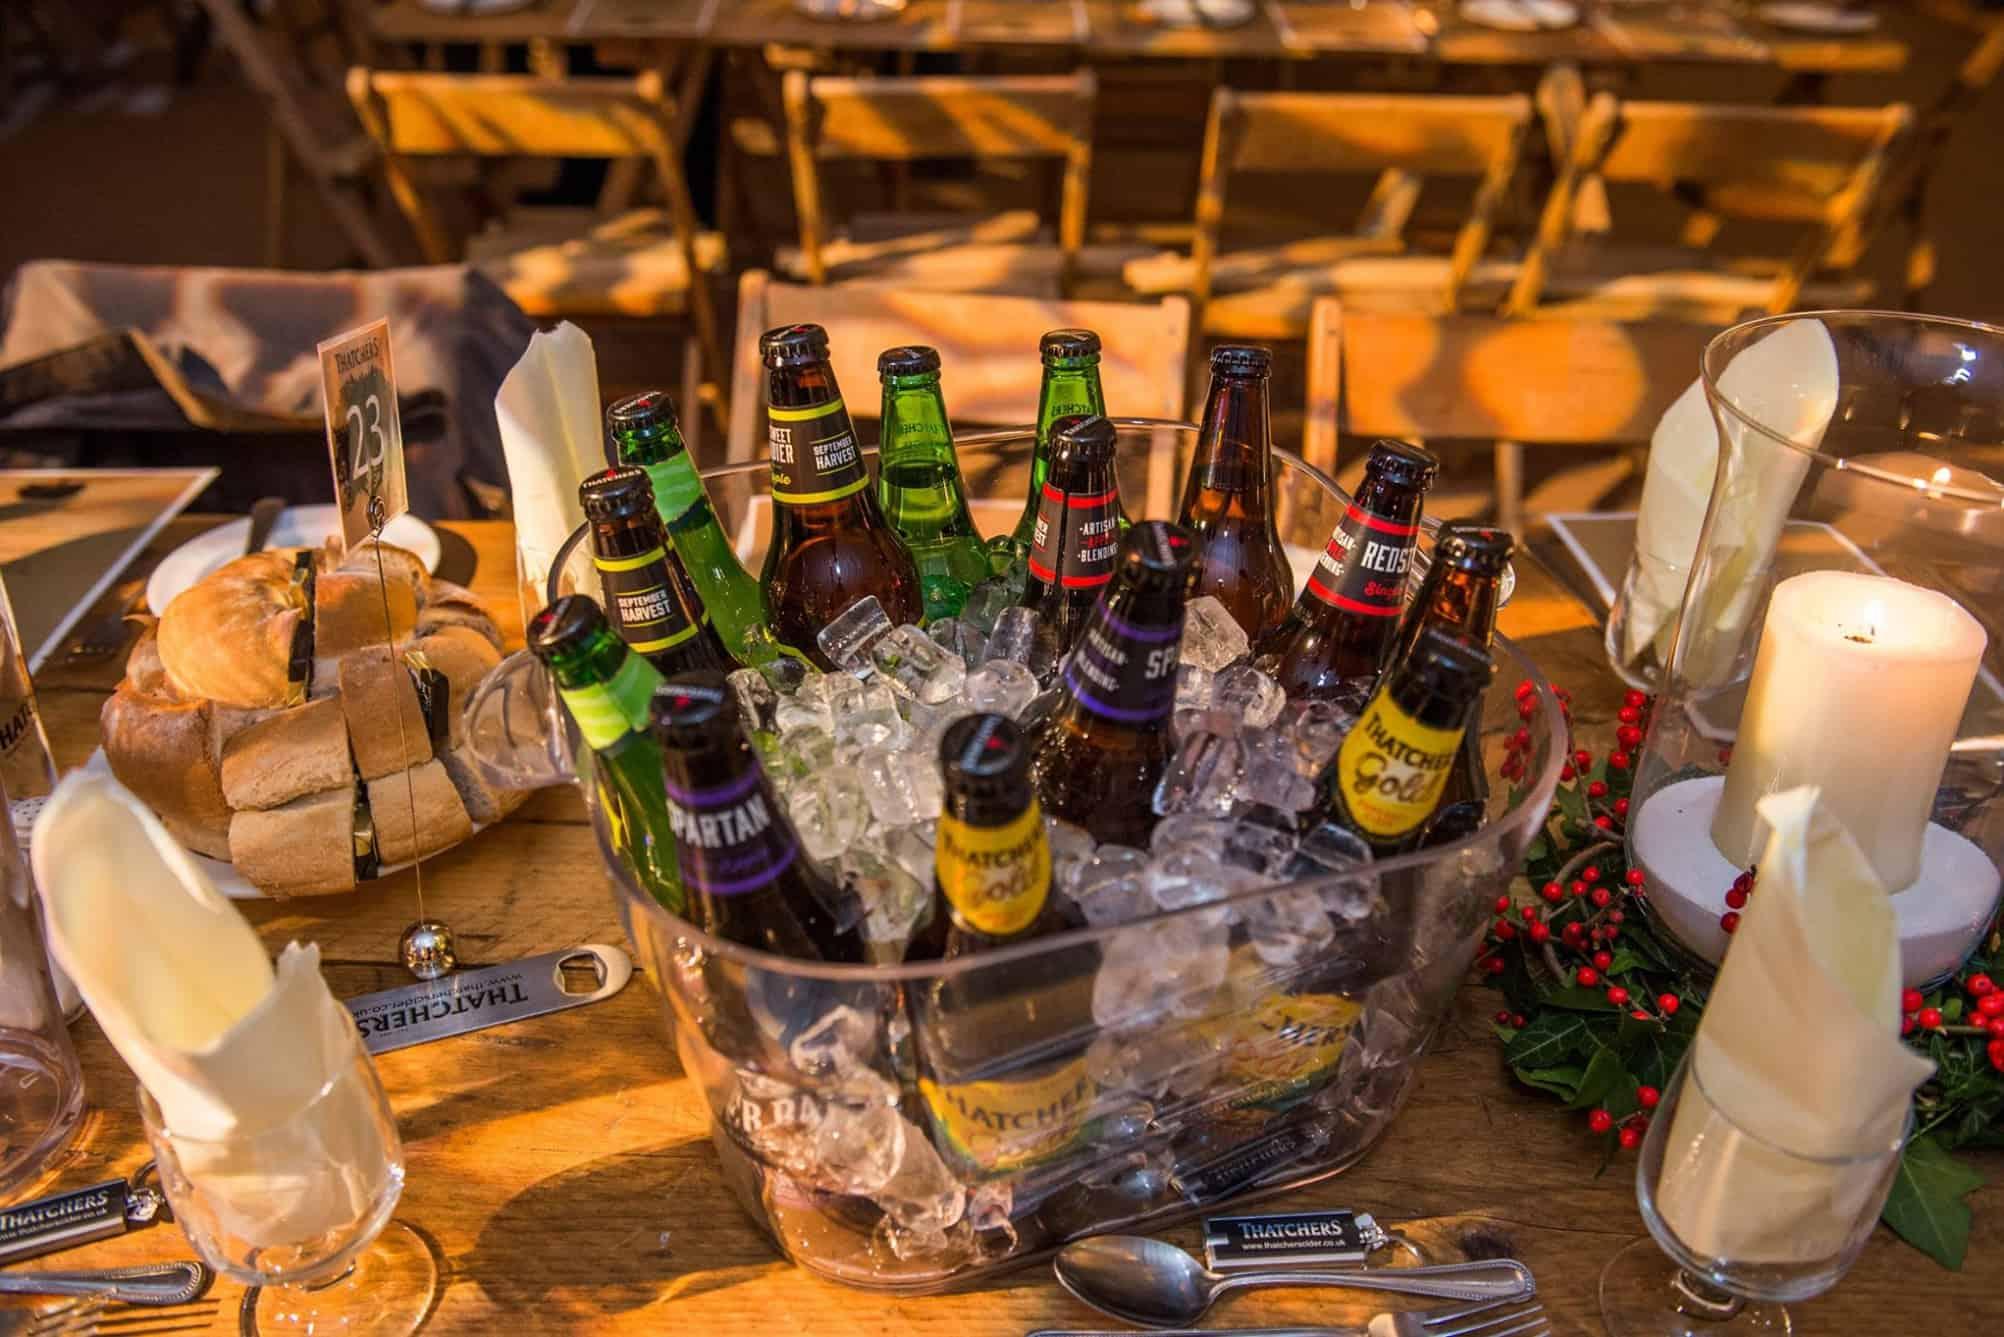 Cider centrepieces